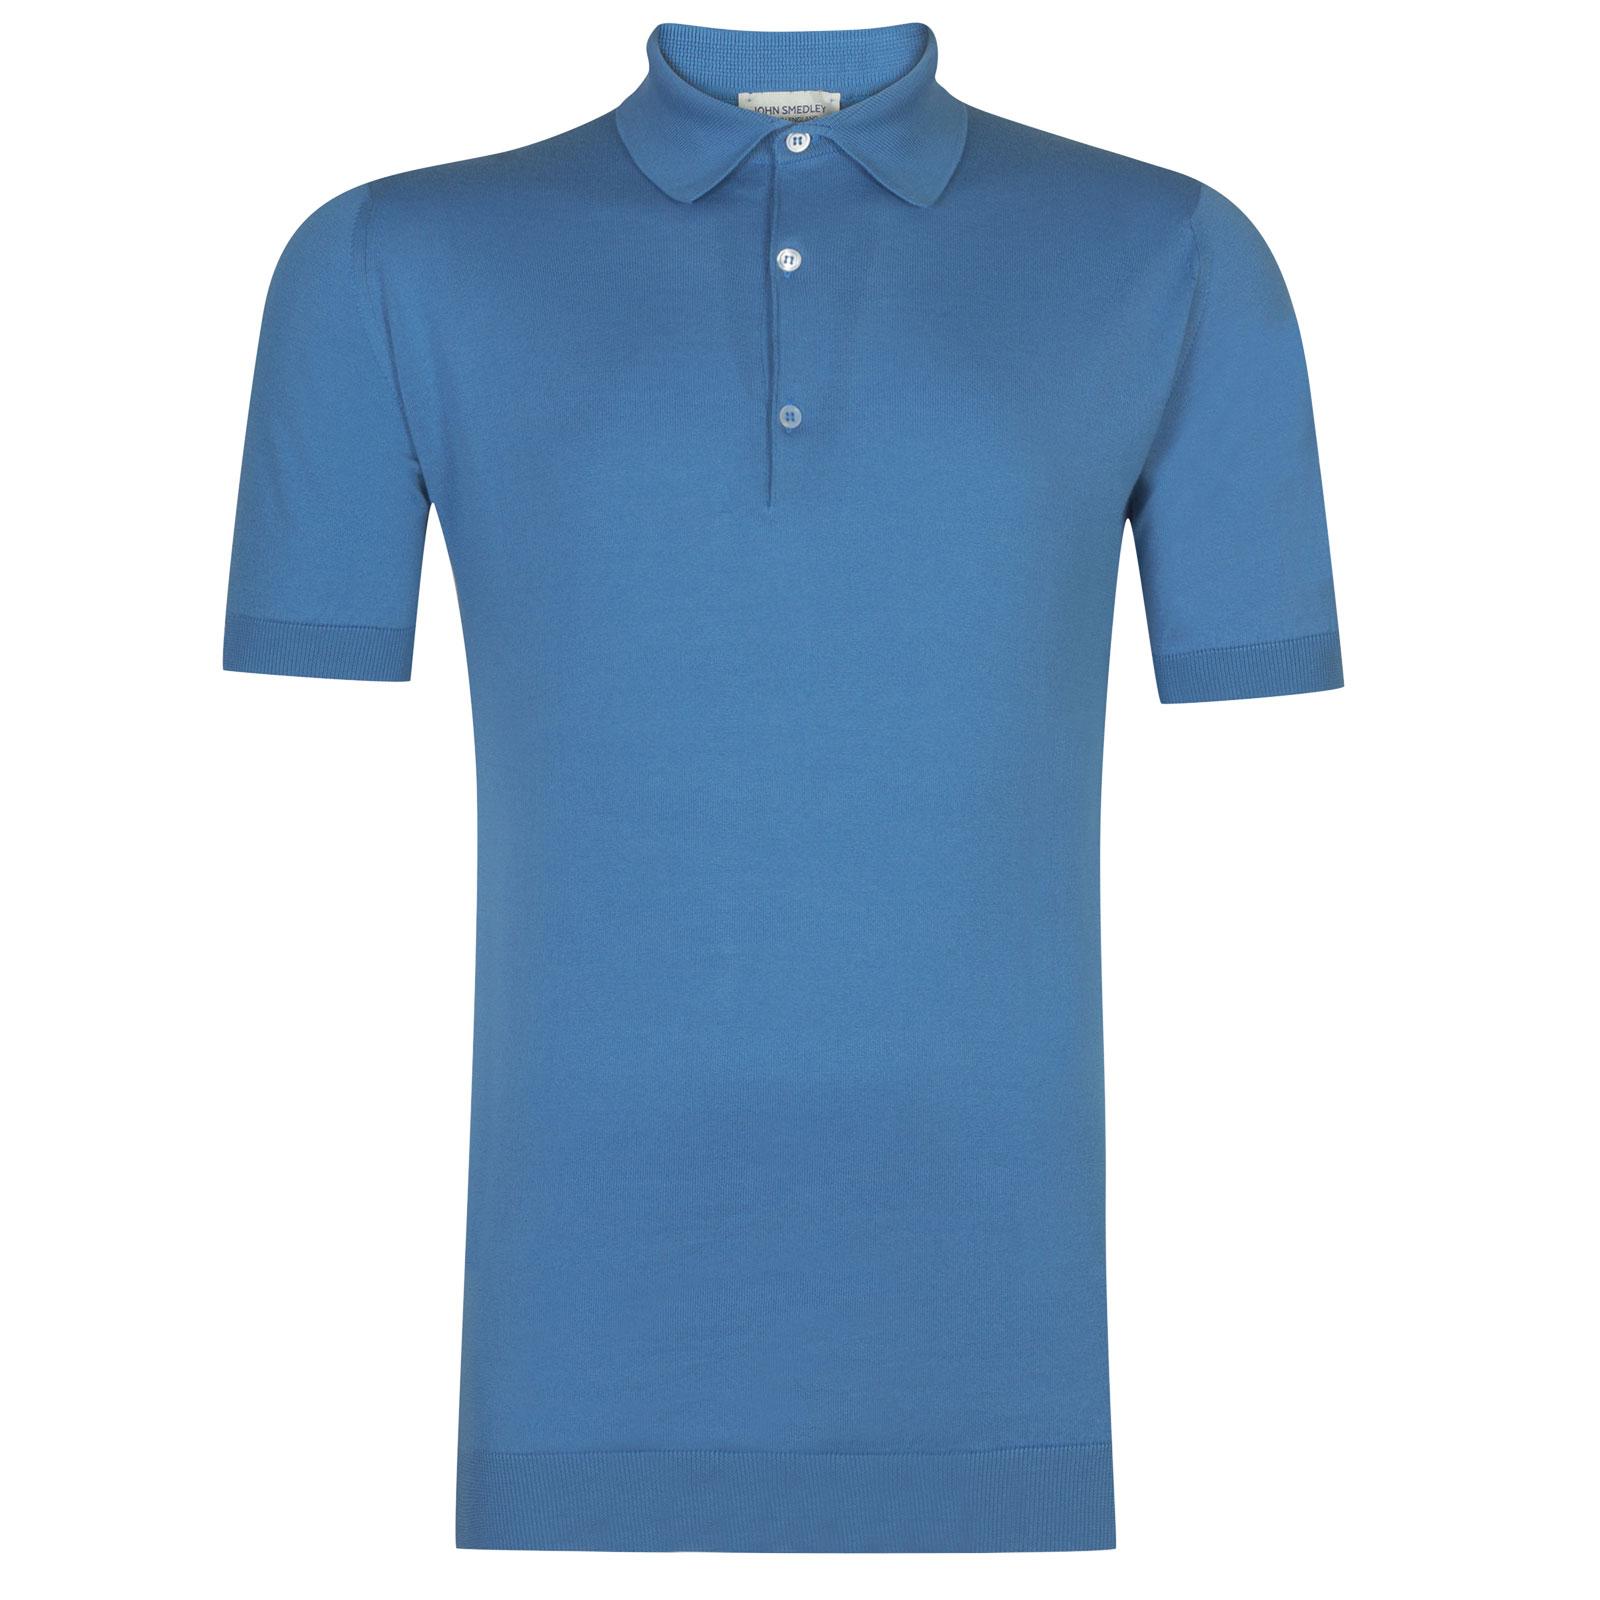 adrian-sebastian-blue-L